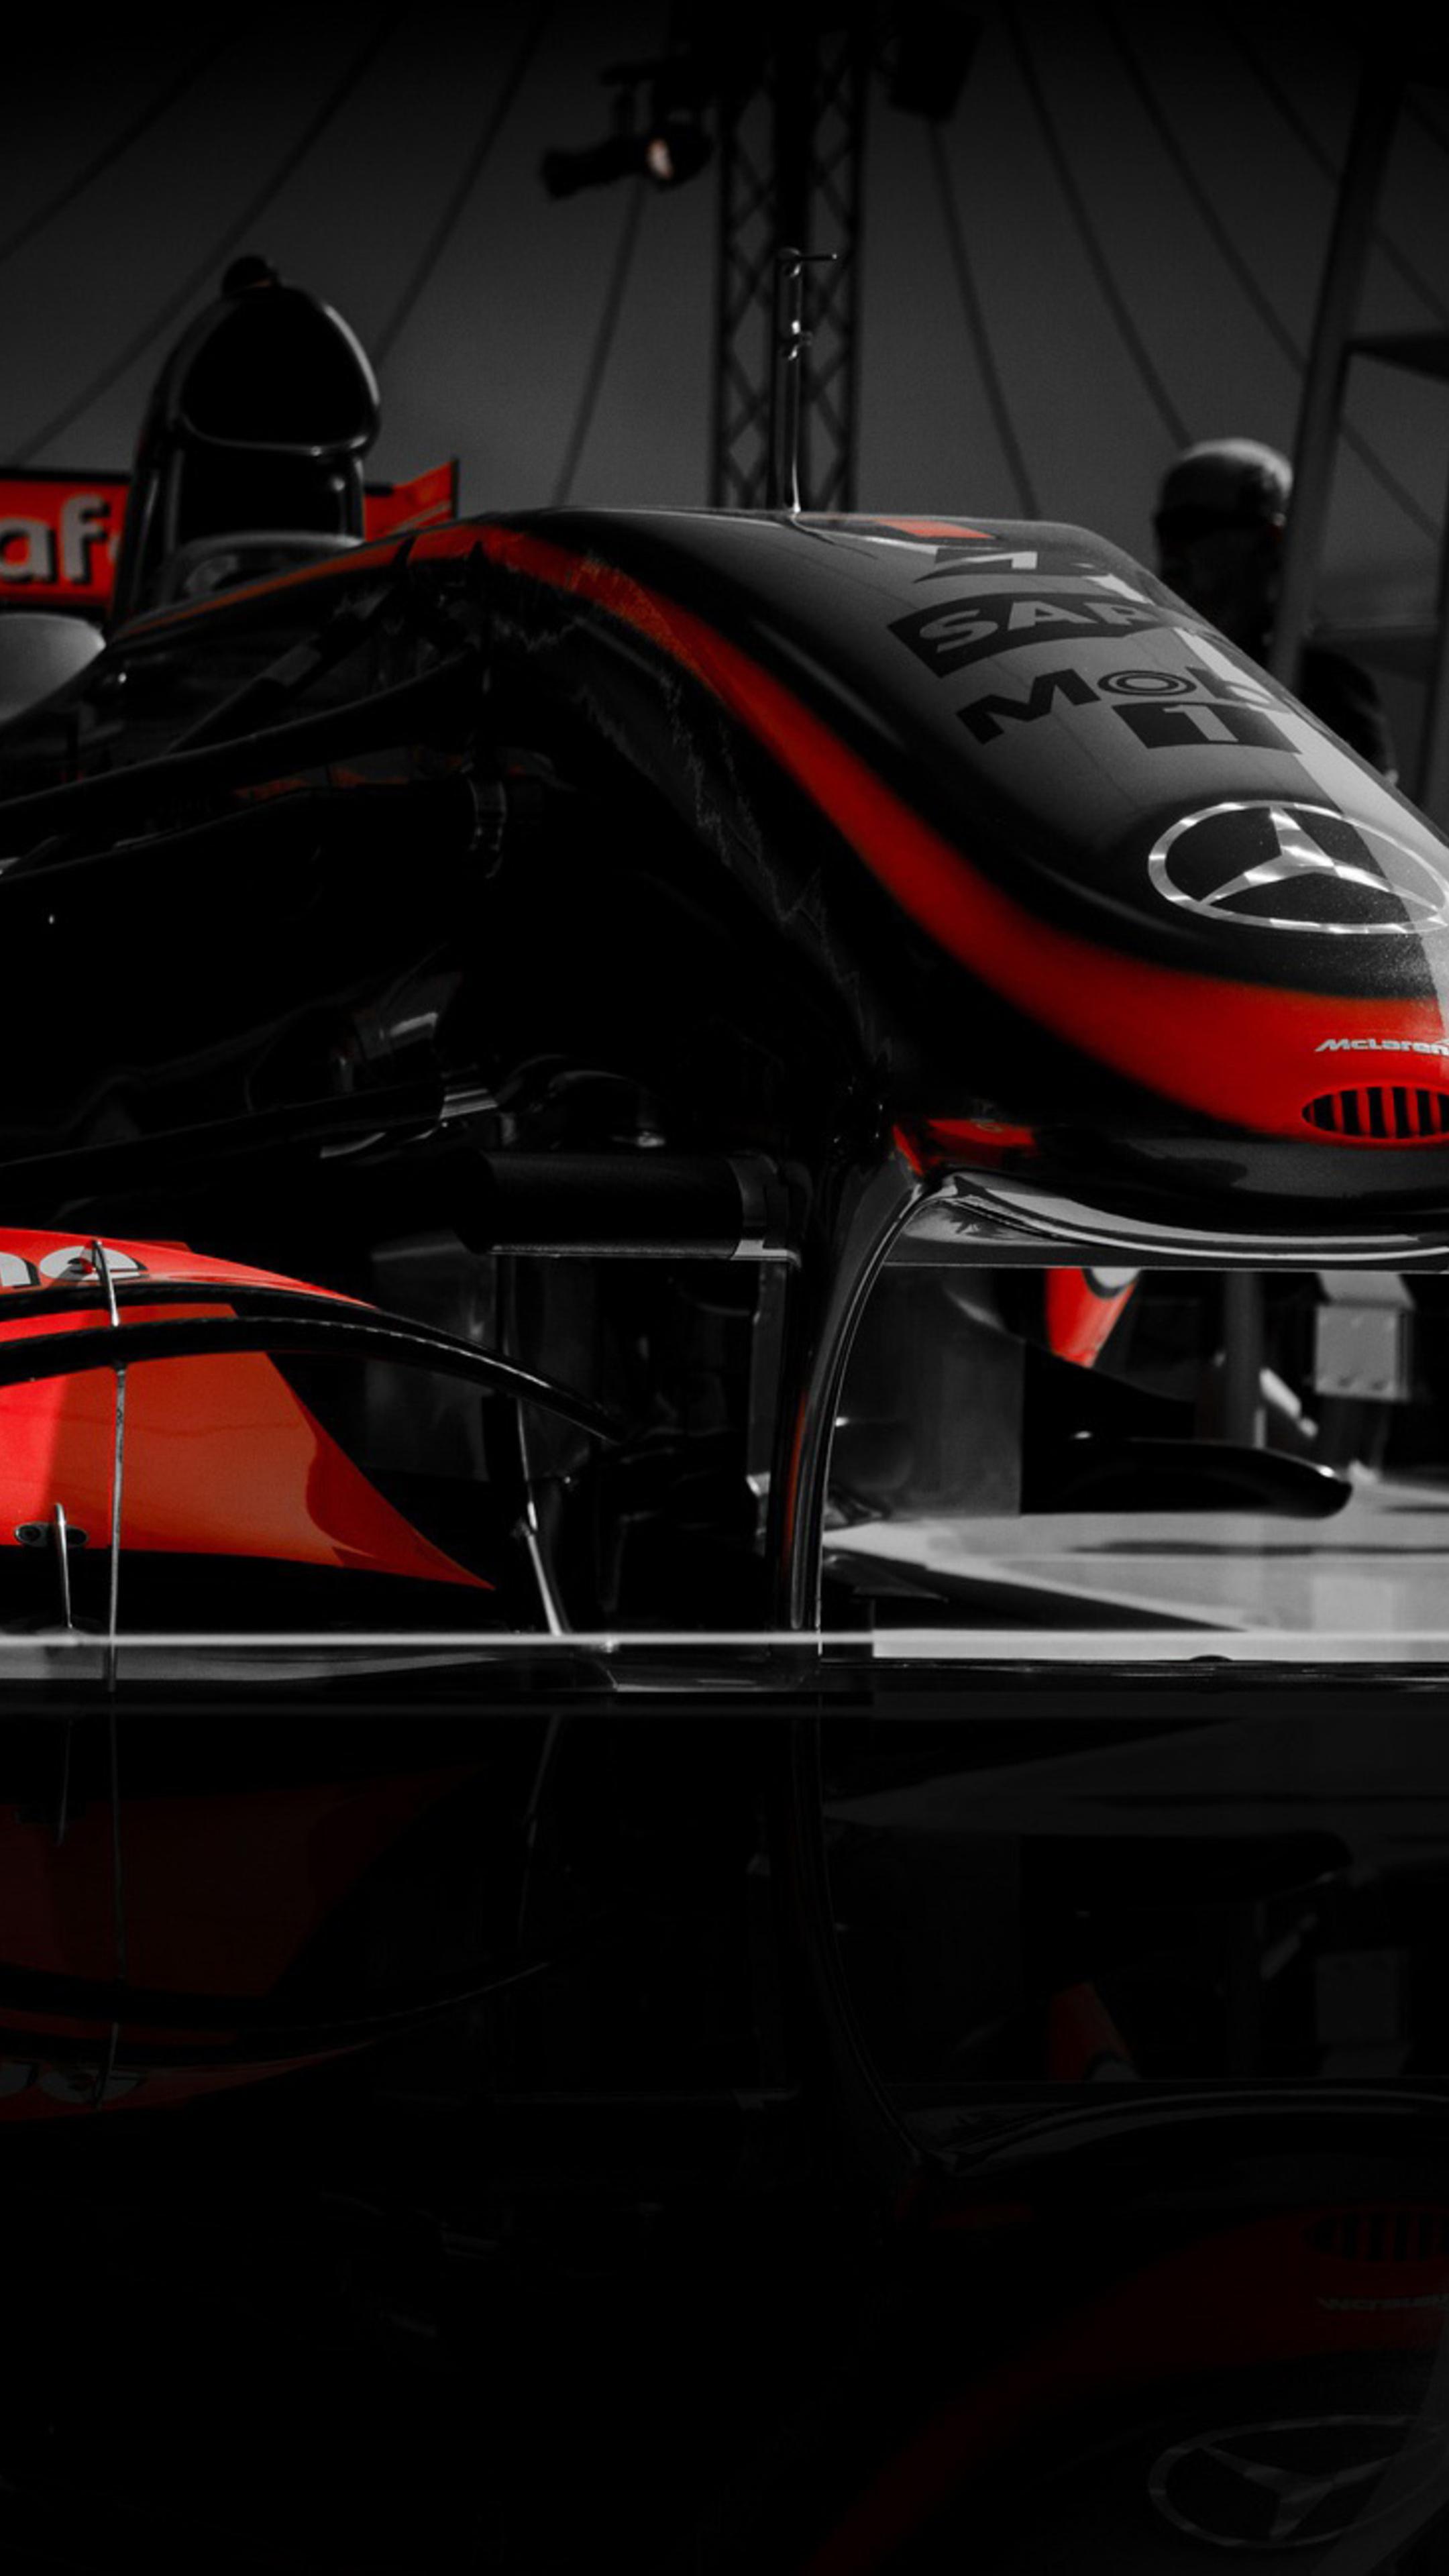 2160x3840 f1 racing car sony xperia x xz z5 premium hd 4k - Car racing wallpaper free download ...